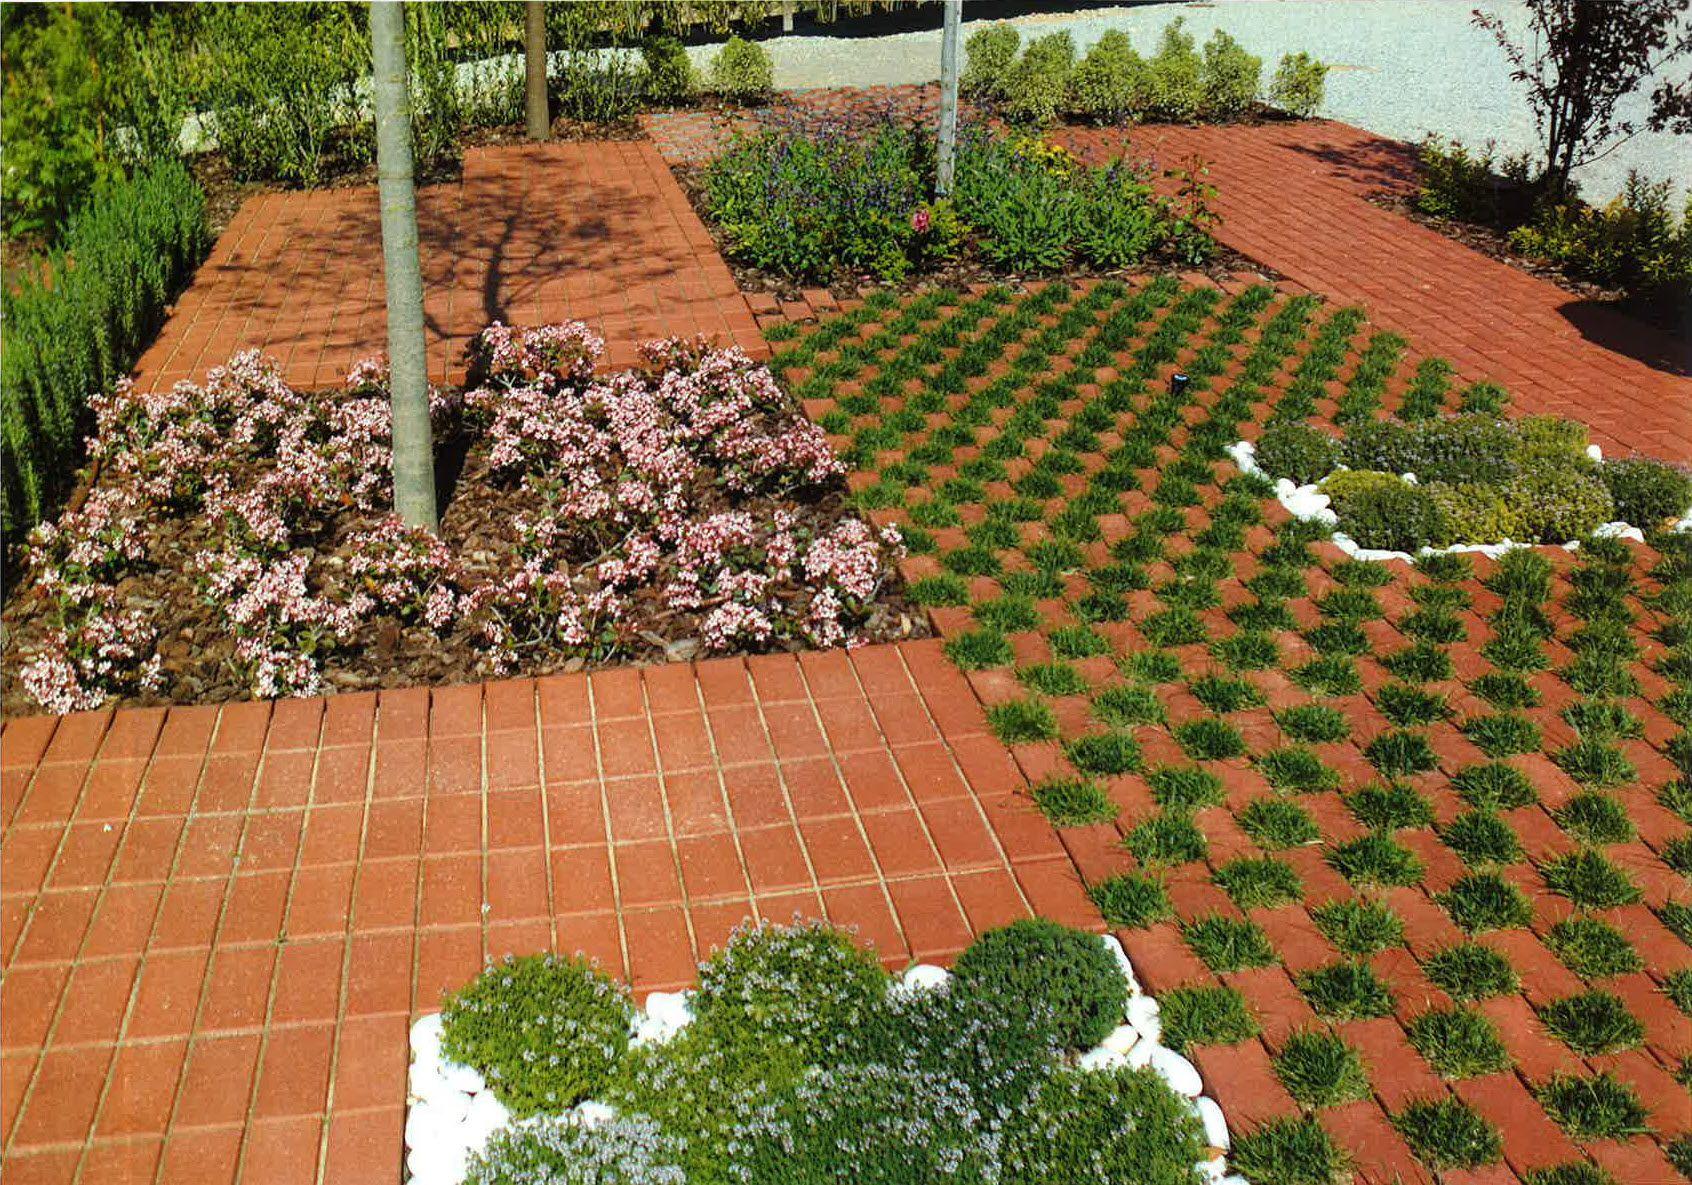 Flexbrick tejido cer mico ceramic textiles tissu c ramique teixit cer mic pavimento drenante - Pavimento jardin ...